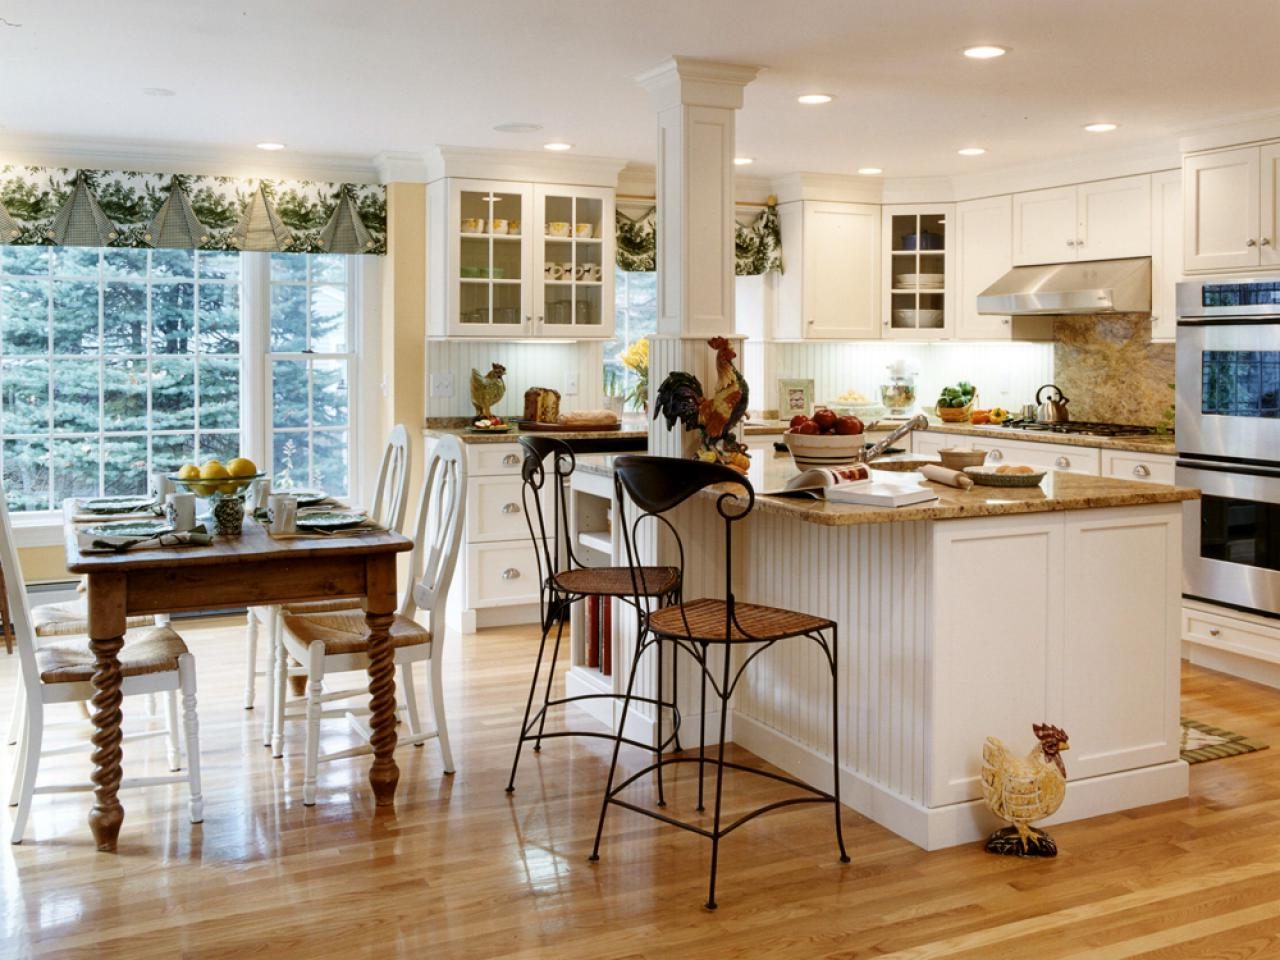 Wooden country style kitchens kitchen design images - kitchen in country style with wooden floors, wooden LROERFS